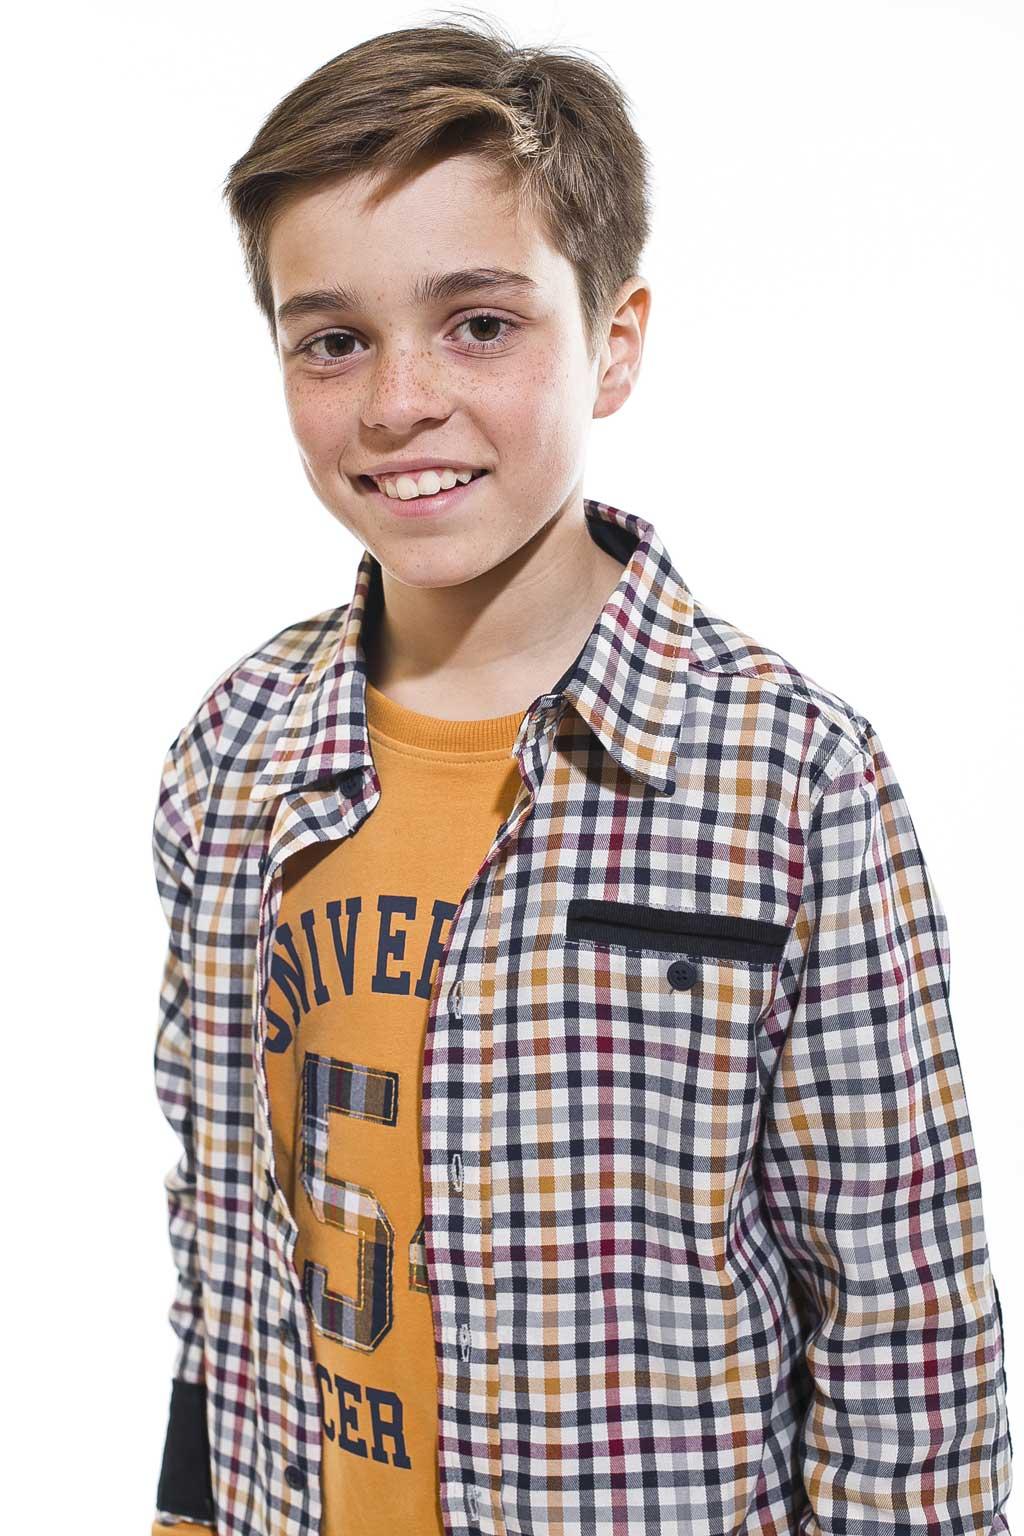 Miguelito (Henrique Mello)